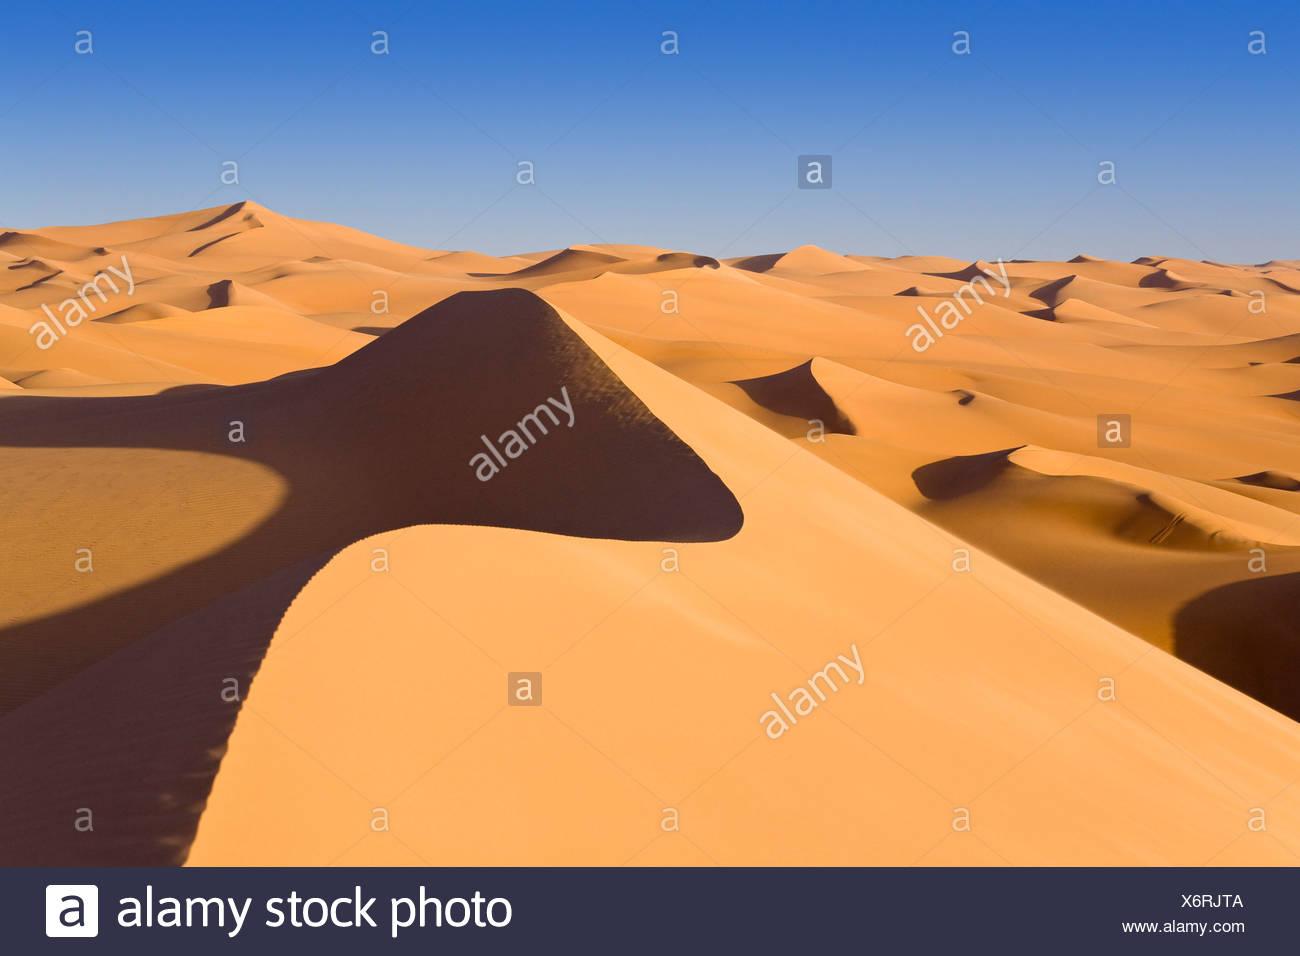 Sand dunes in the Libyan Desert, Sahara, Libya, North Africa, Africa - Stock Image